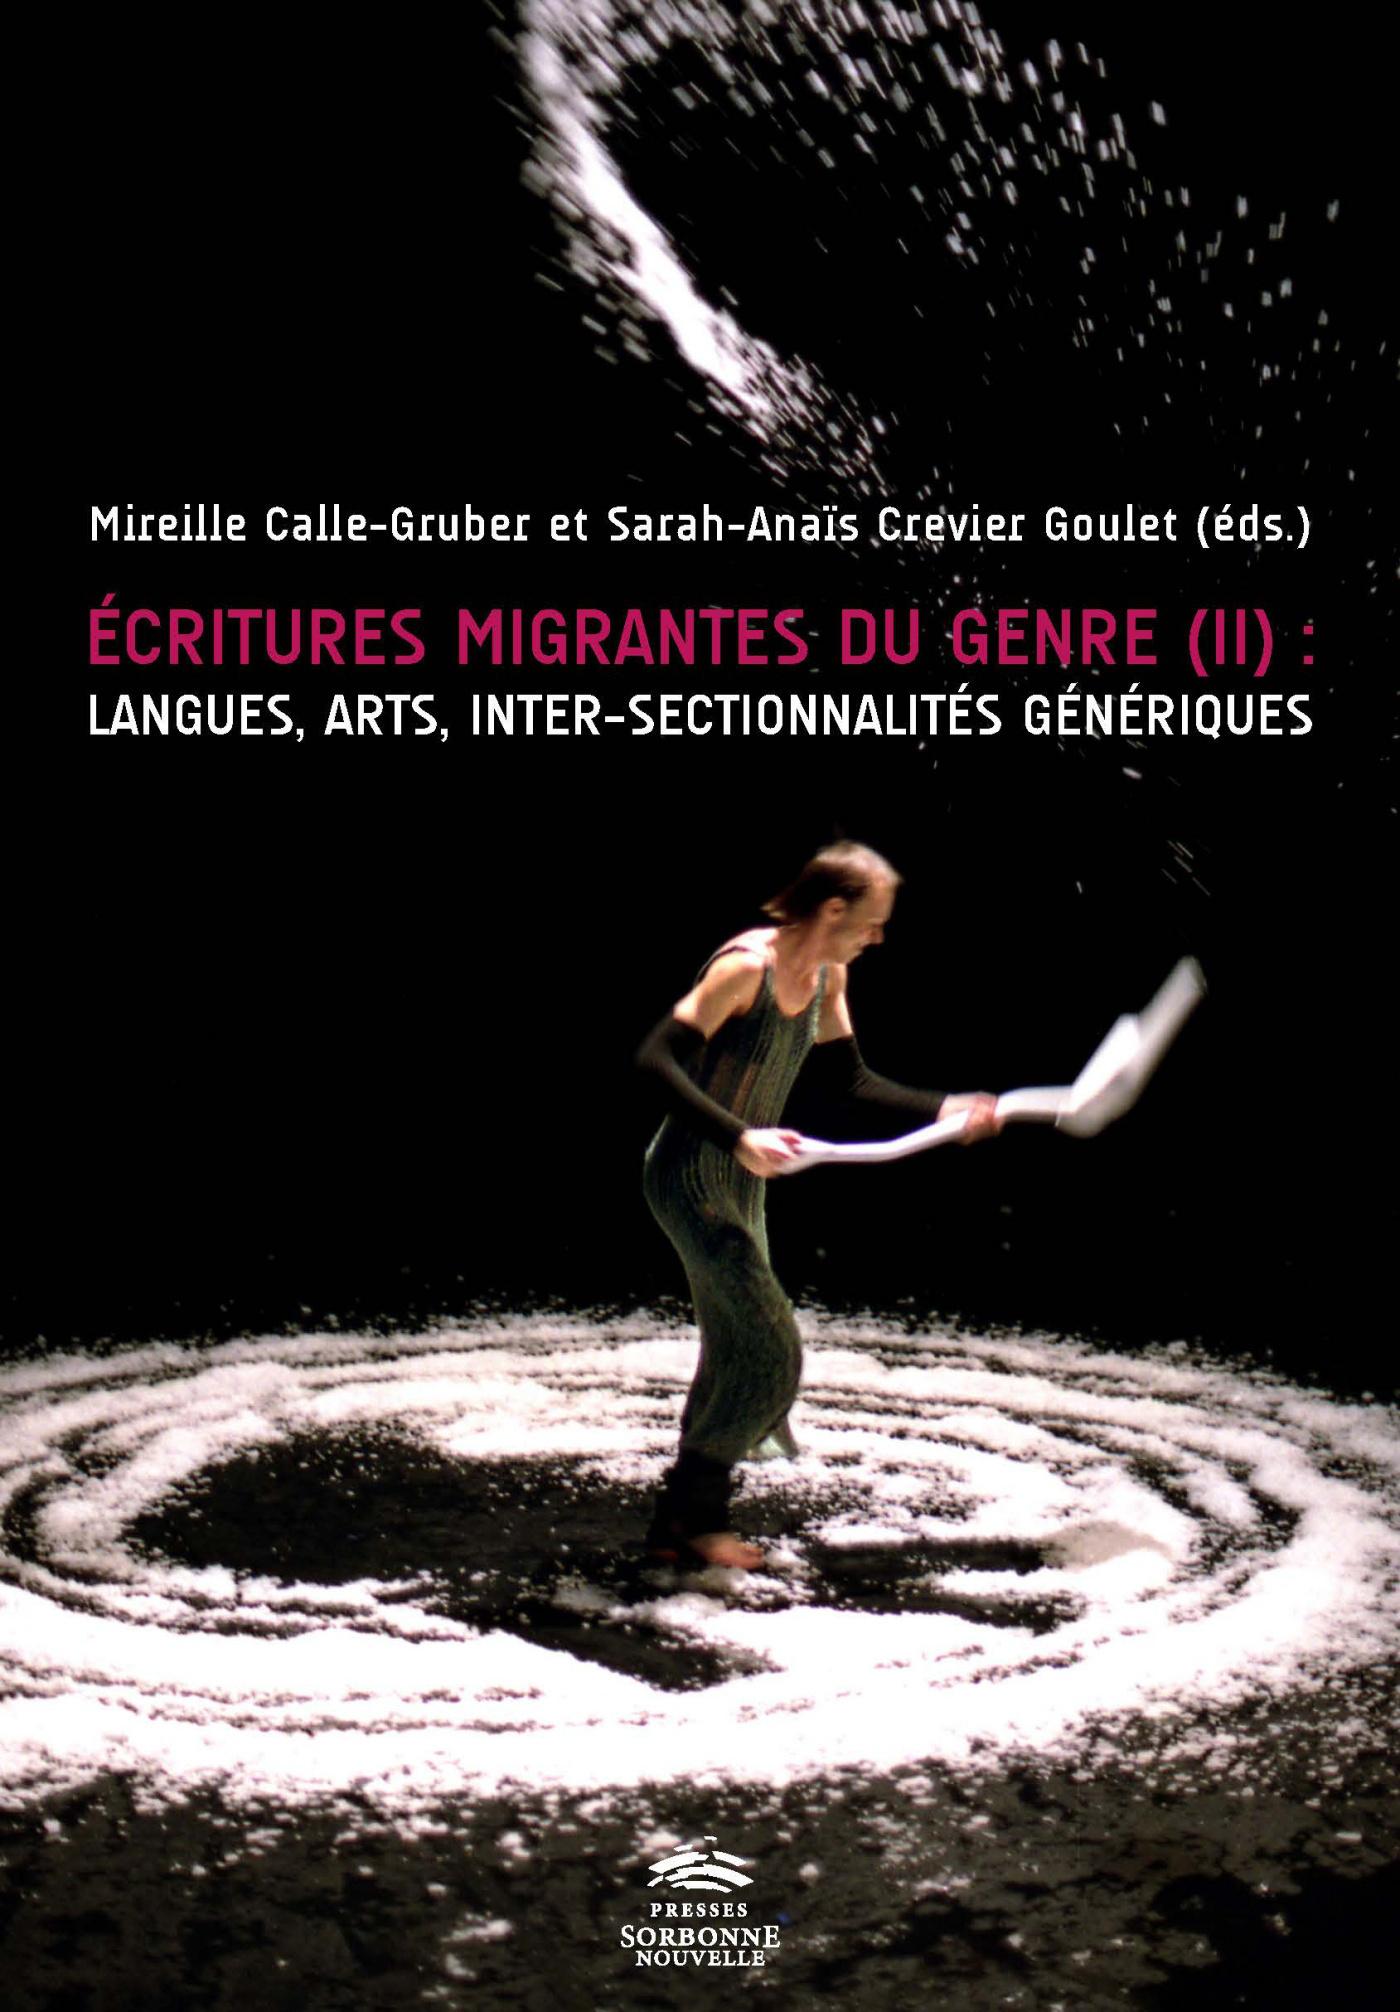 ECRITURES MIGRANTES DU GENRE (II). LANGUES, ARTS, INTER-SECTIONNALITE S GENERIQUES